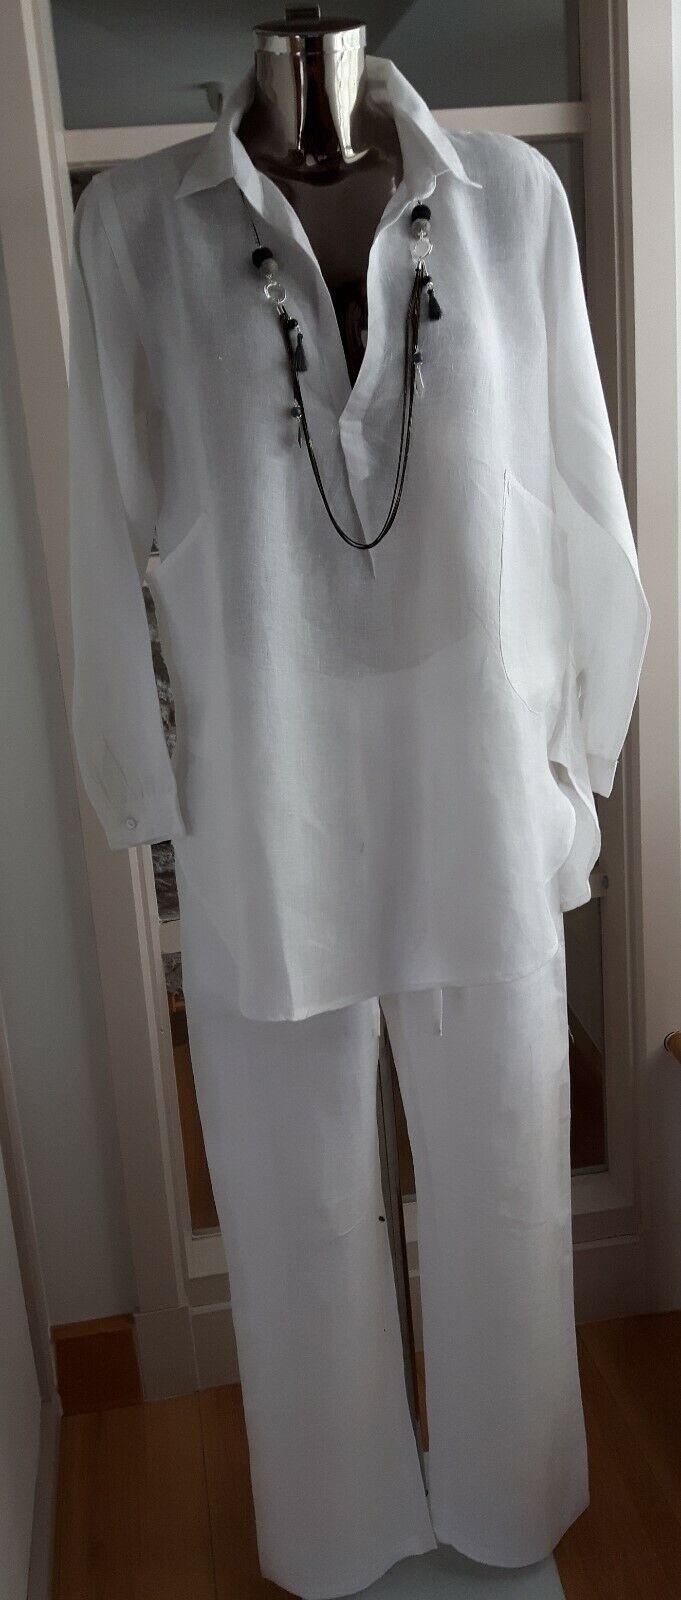 BNWT quality Weiß linen long sleeve slip on tunic Größe M